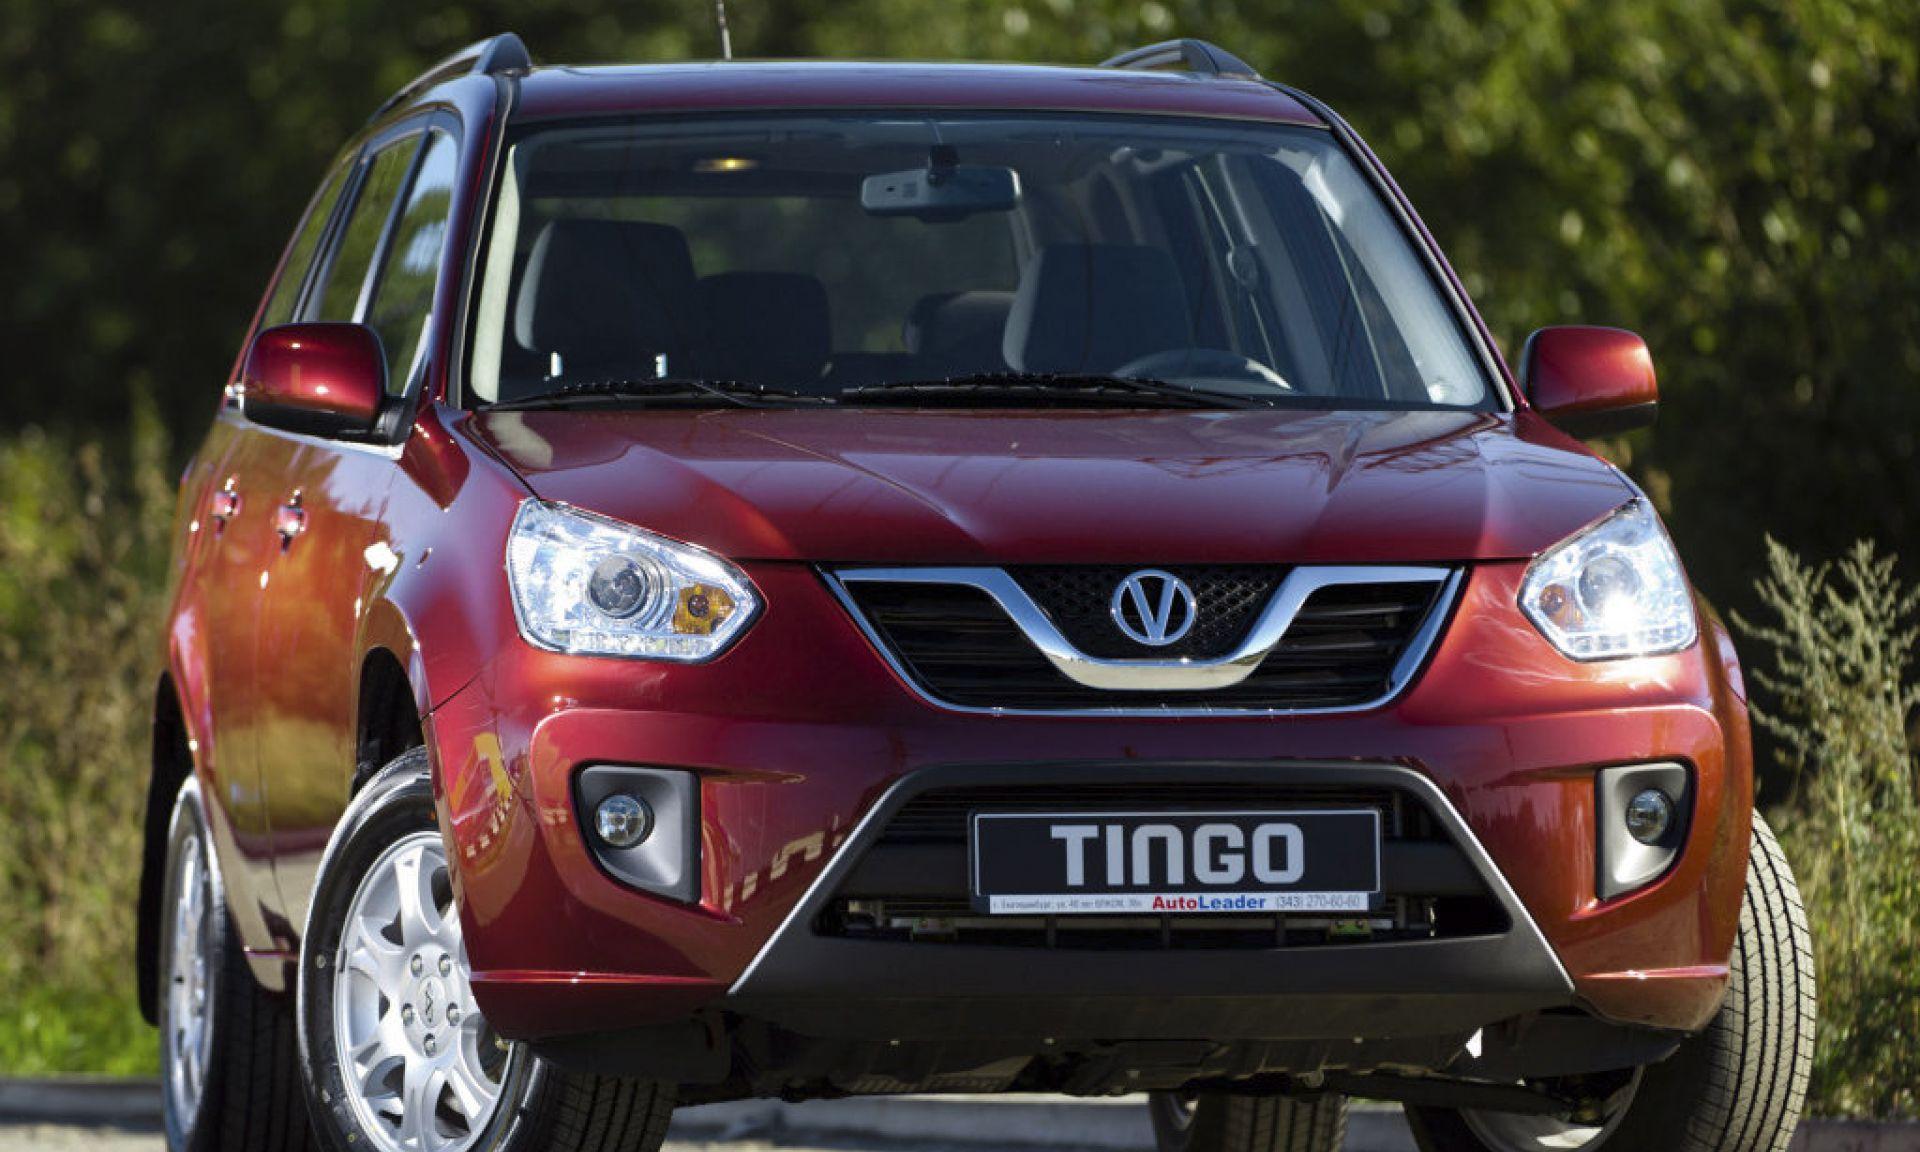 Vortex Tingo I 2011 - 2012 SUV 5 door #3